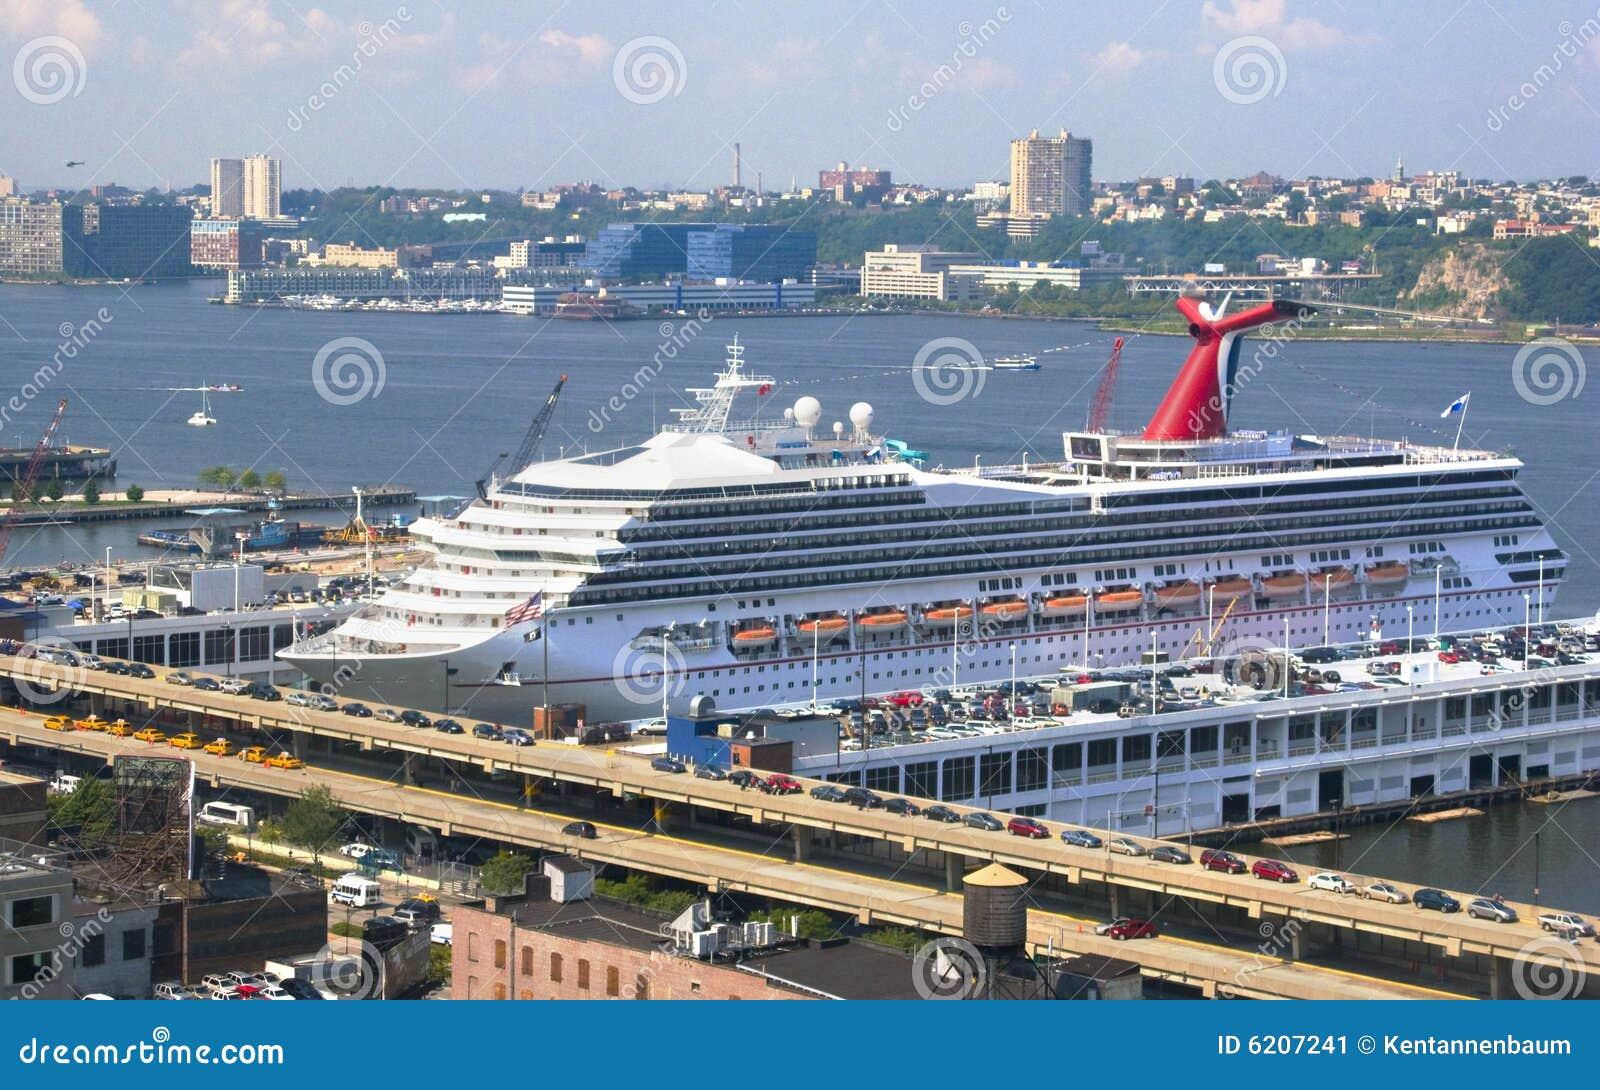 Cruise Ship Docked In New York City Port Stock Image - Image 6207241